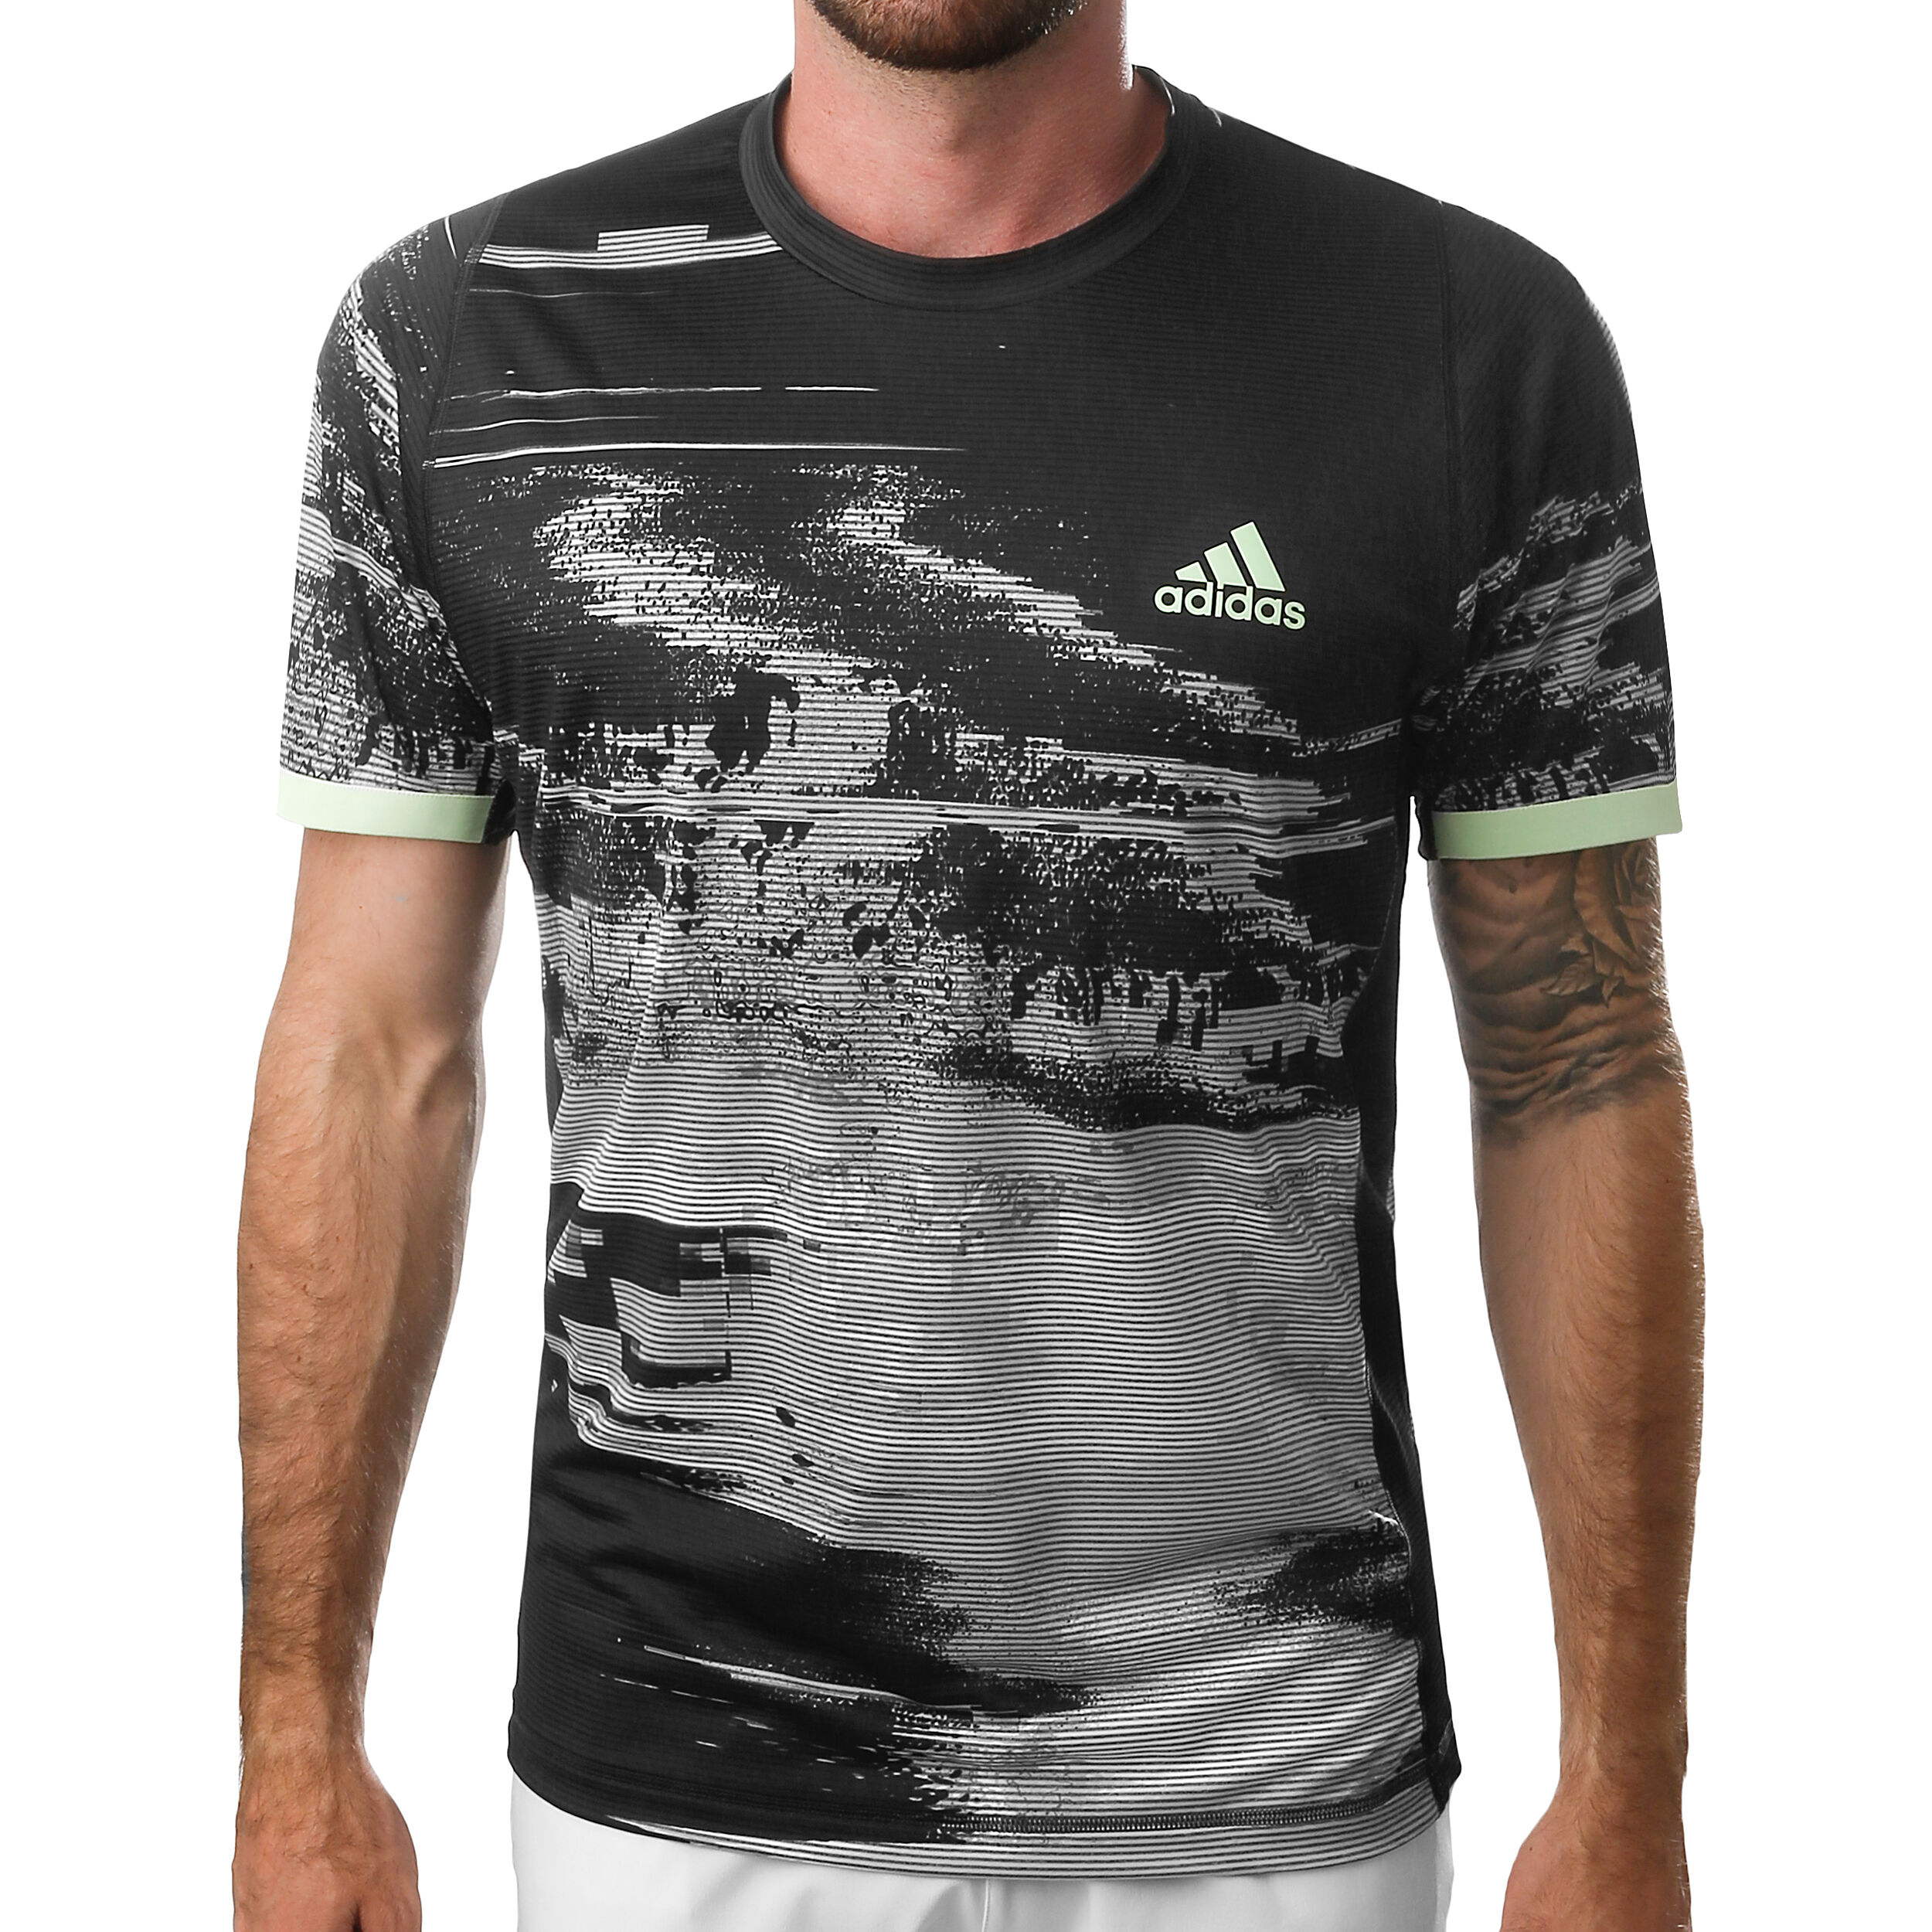 Adidas New York Printed Camiseta de Tenis Hombre Black